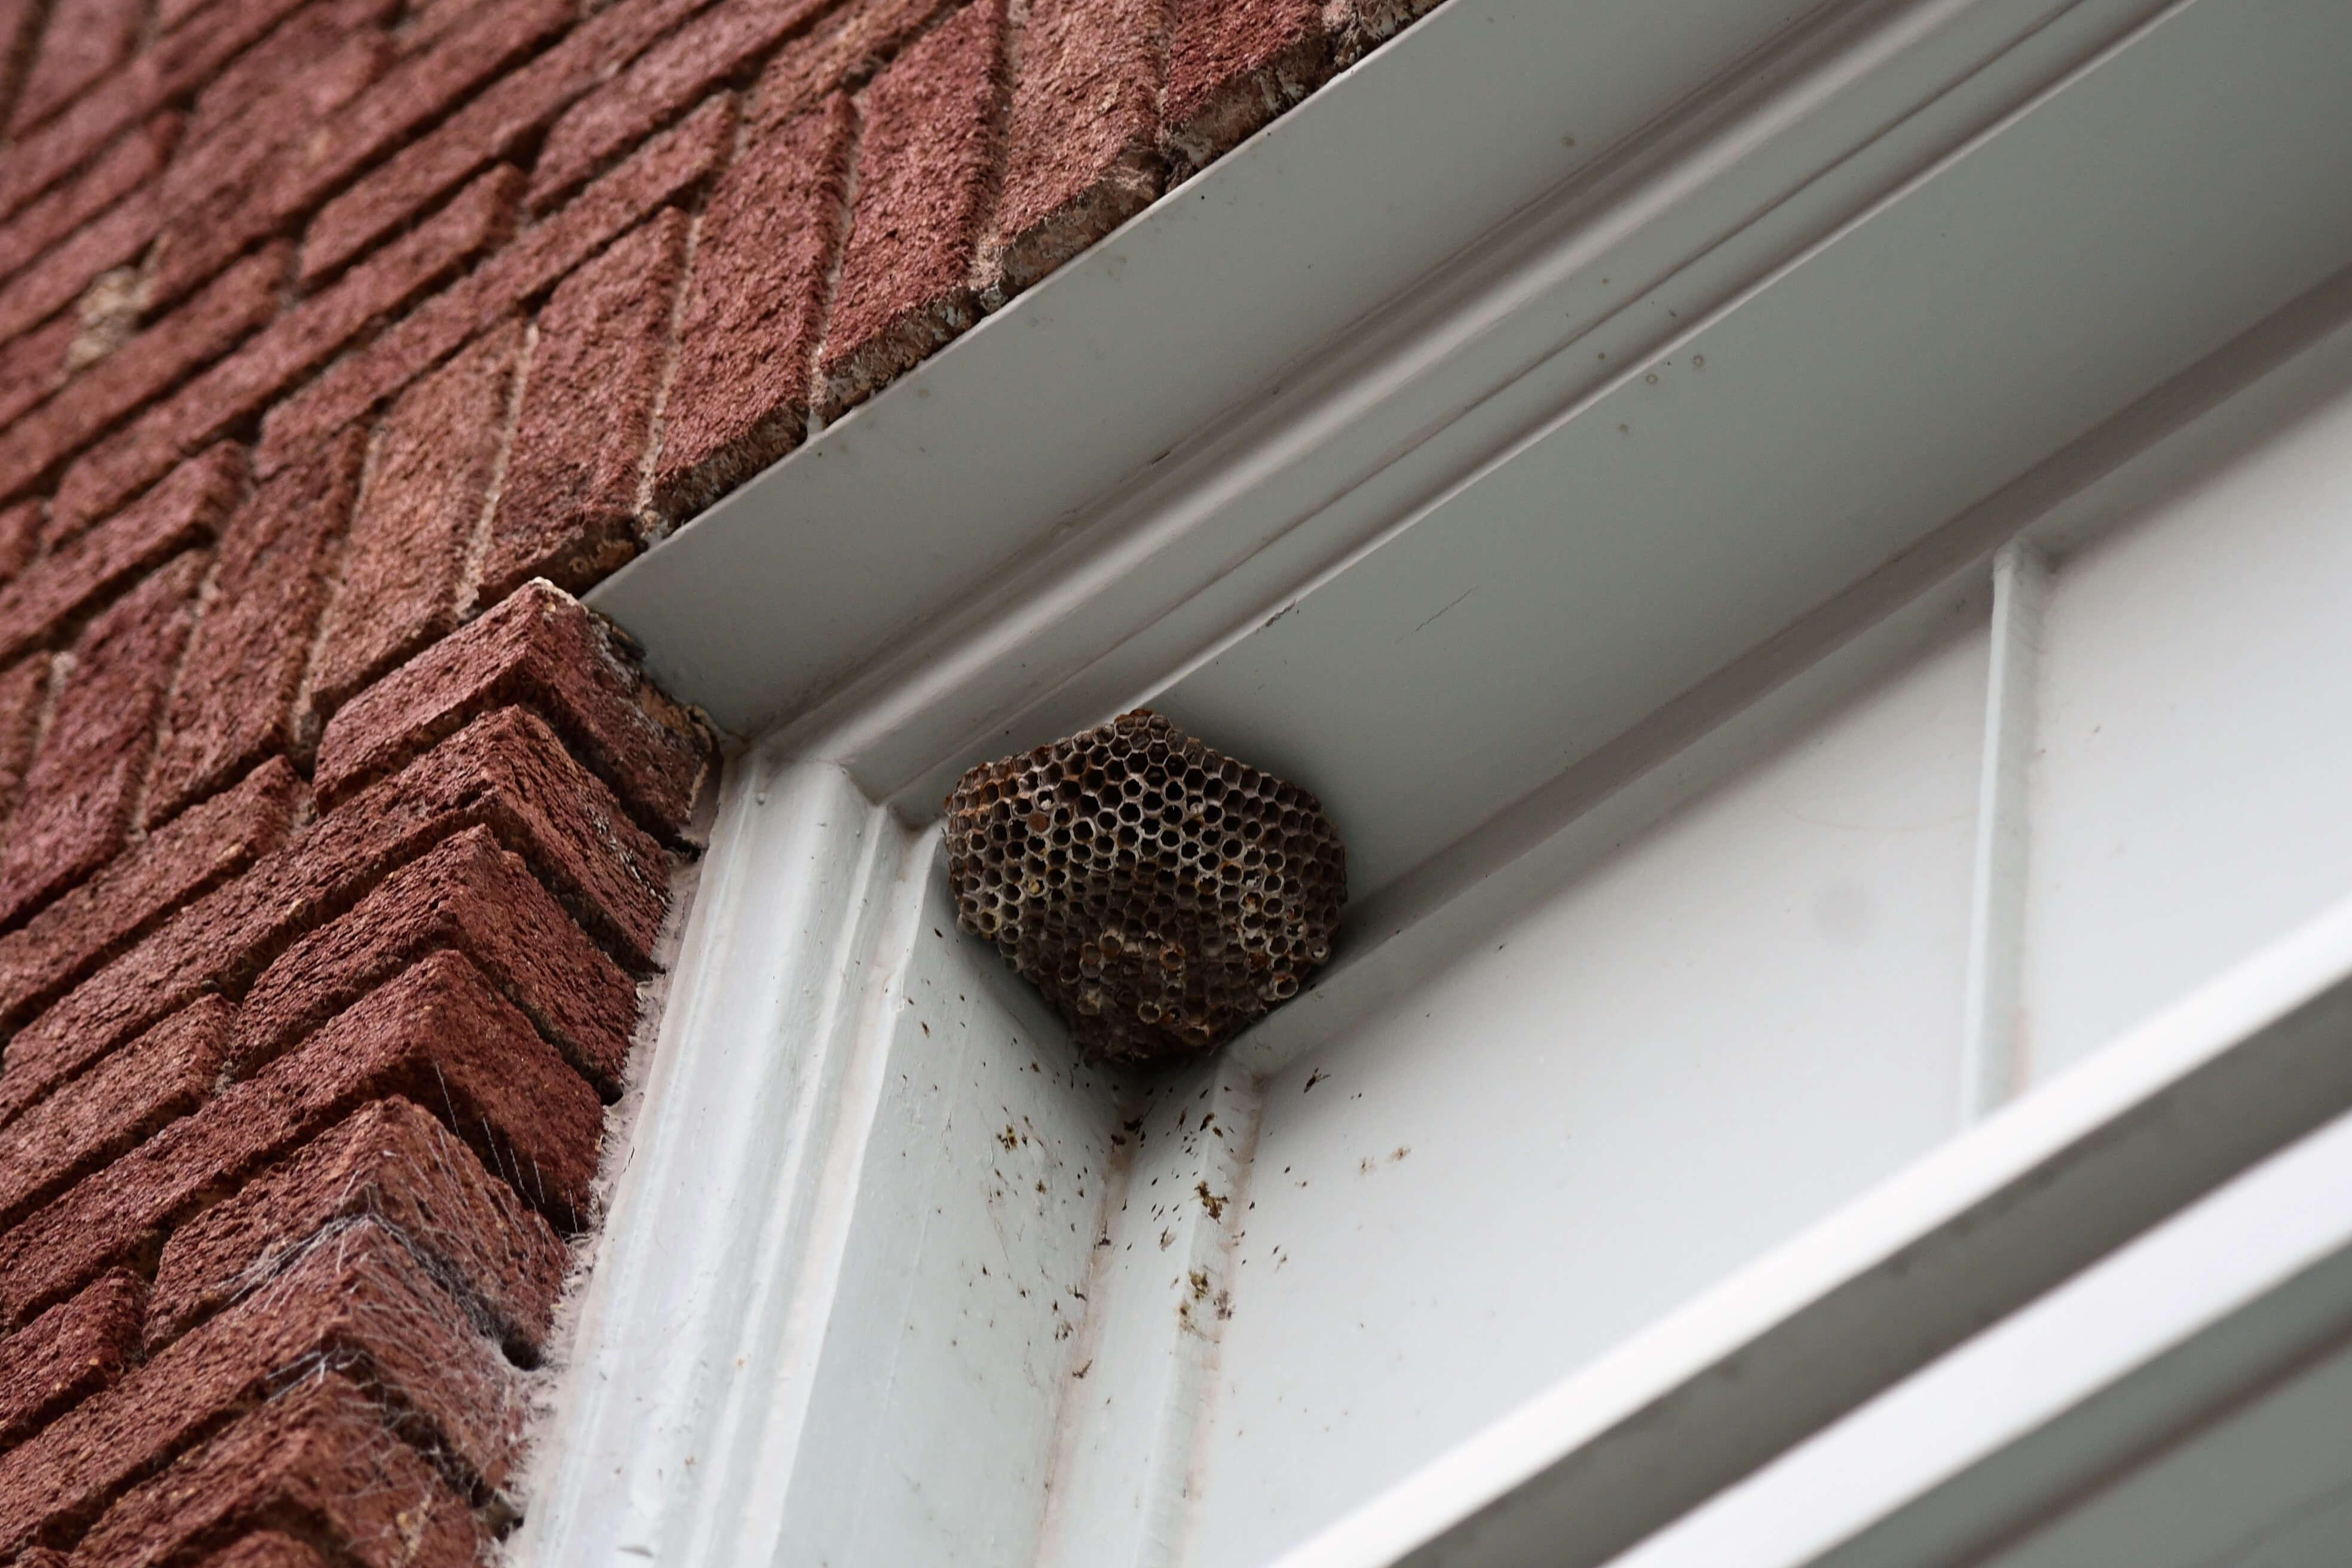 Wasp Nest In Window Frame (1)